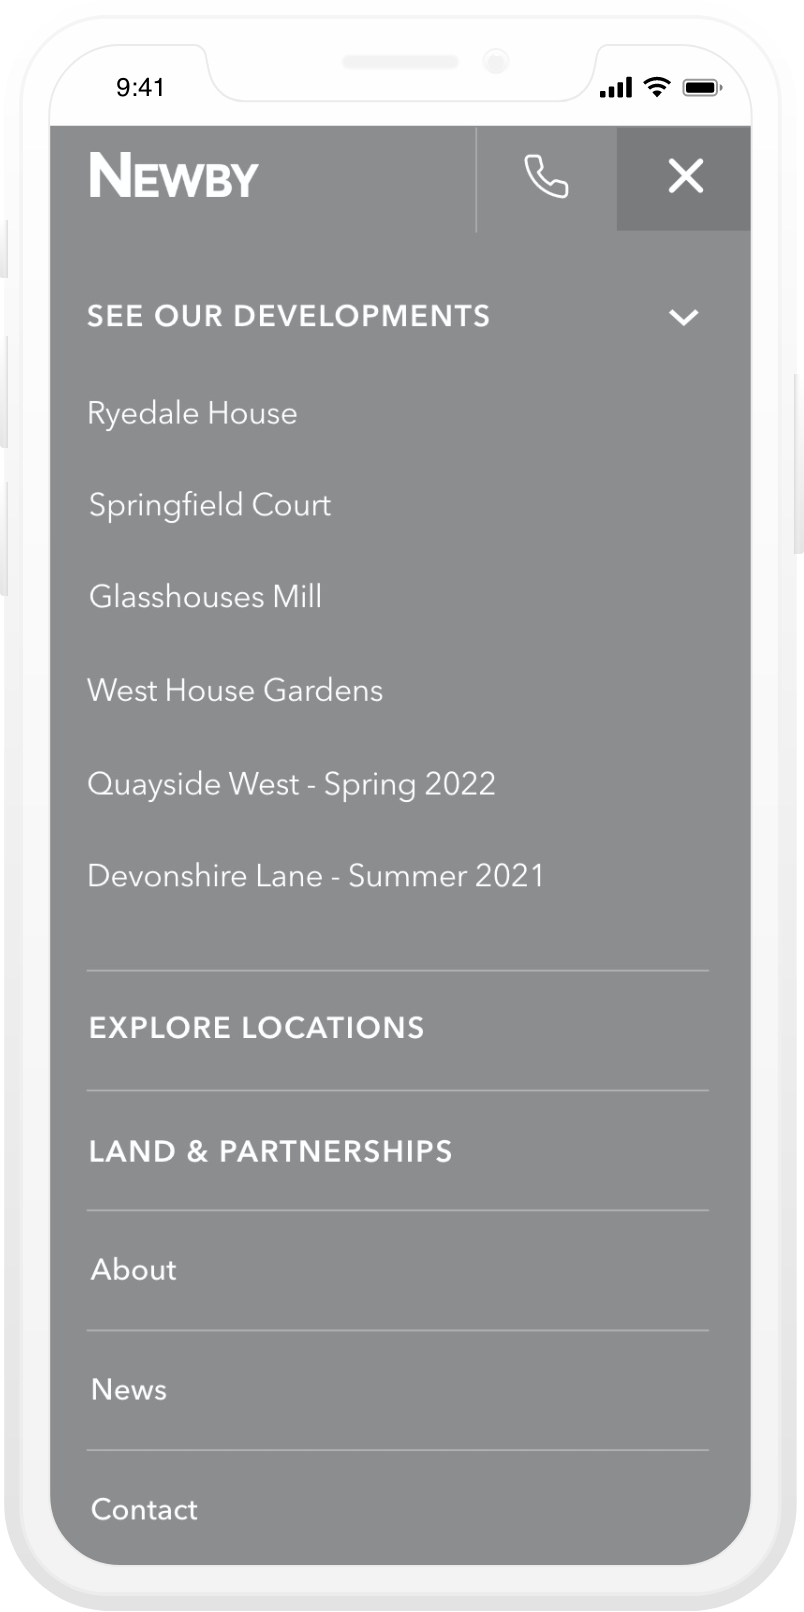 Newby homes mobile development website